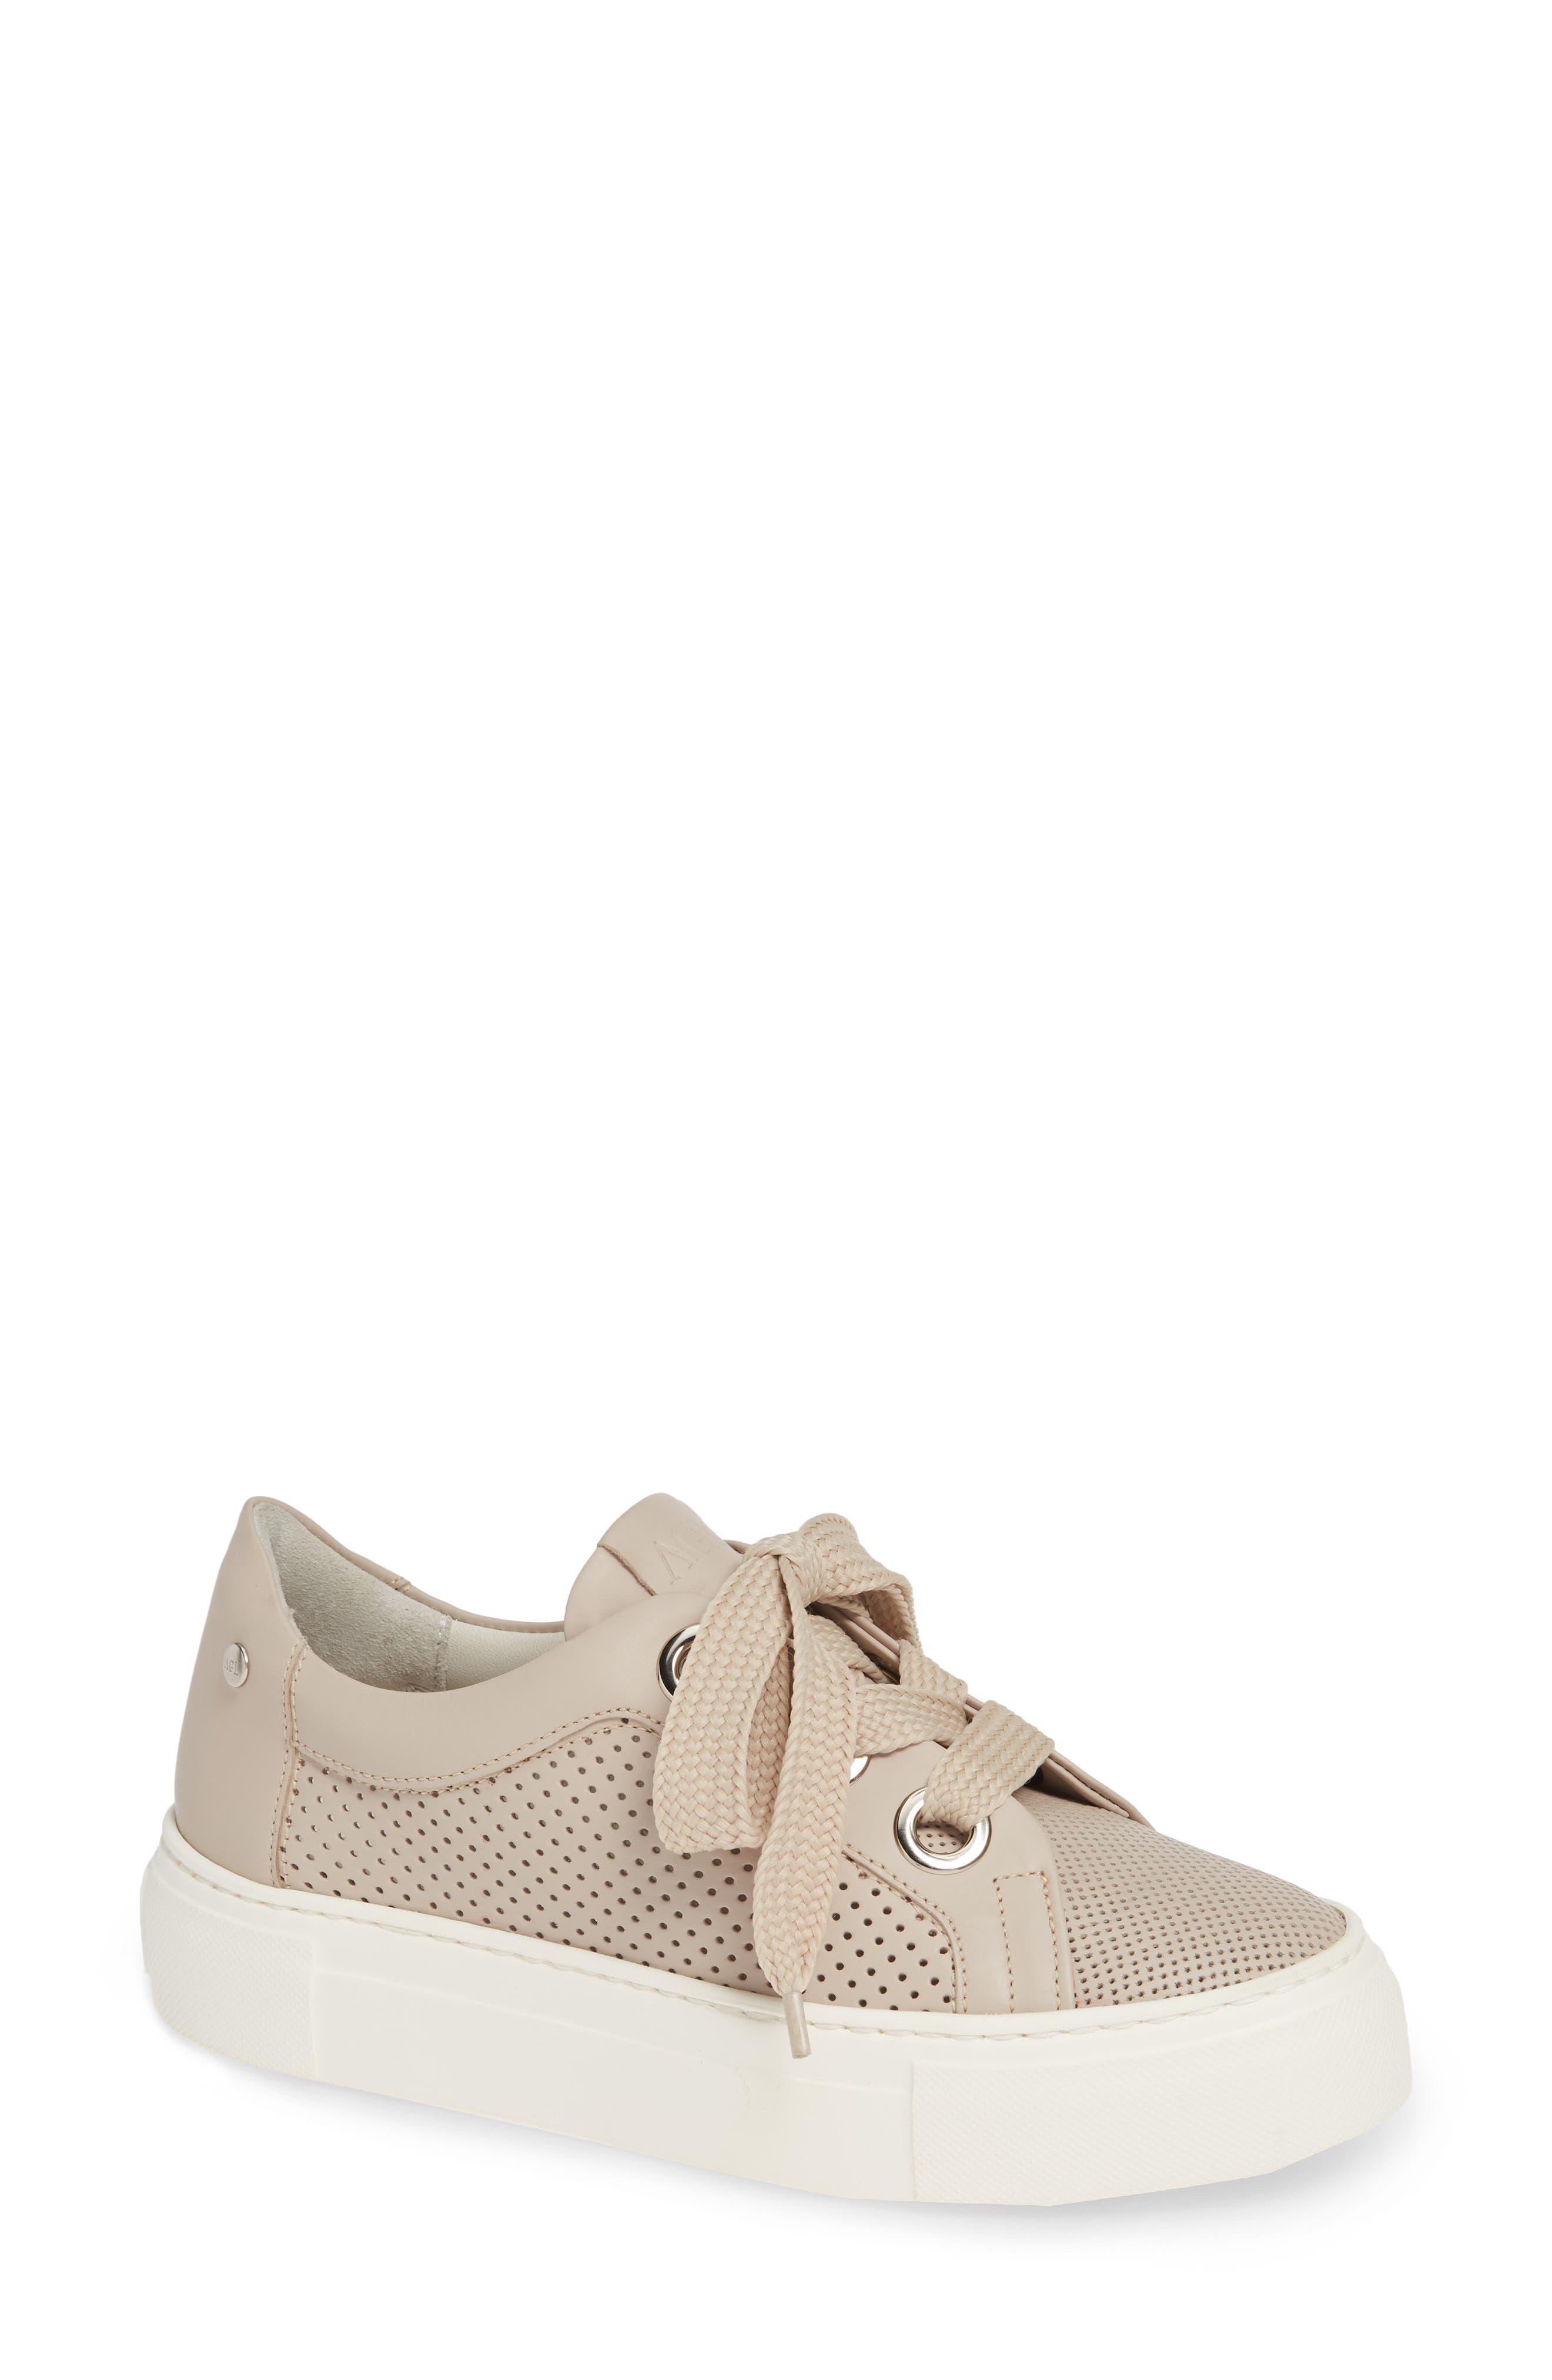 AGL ATTILIO GIUSTI LEOMBRUNI Perforated Platform Sneaker in Talc Leather